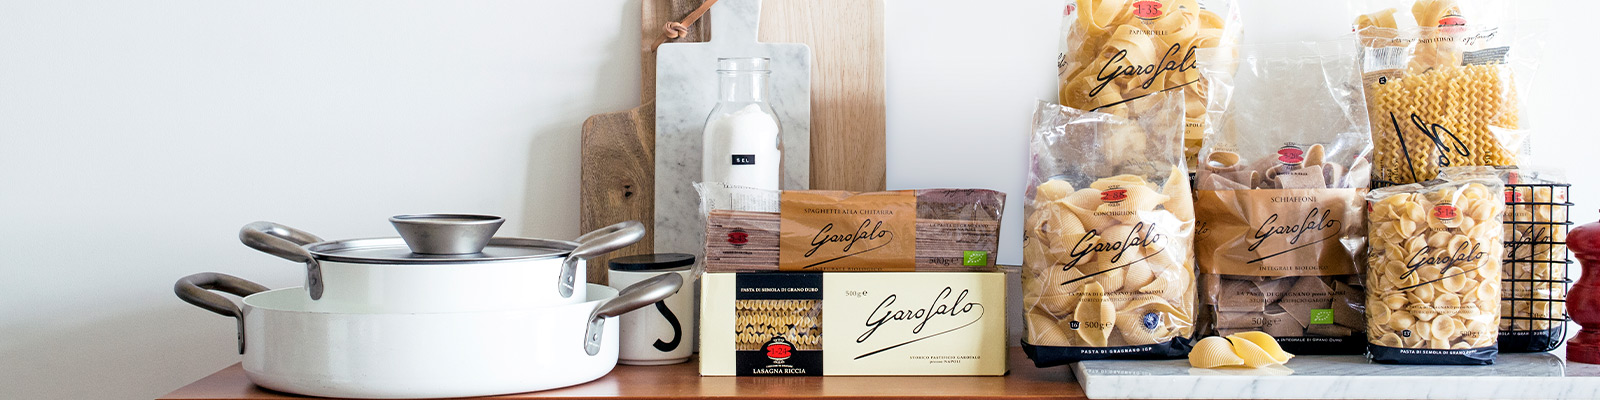 Pasta Garofalo - Produkte